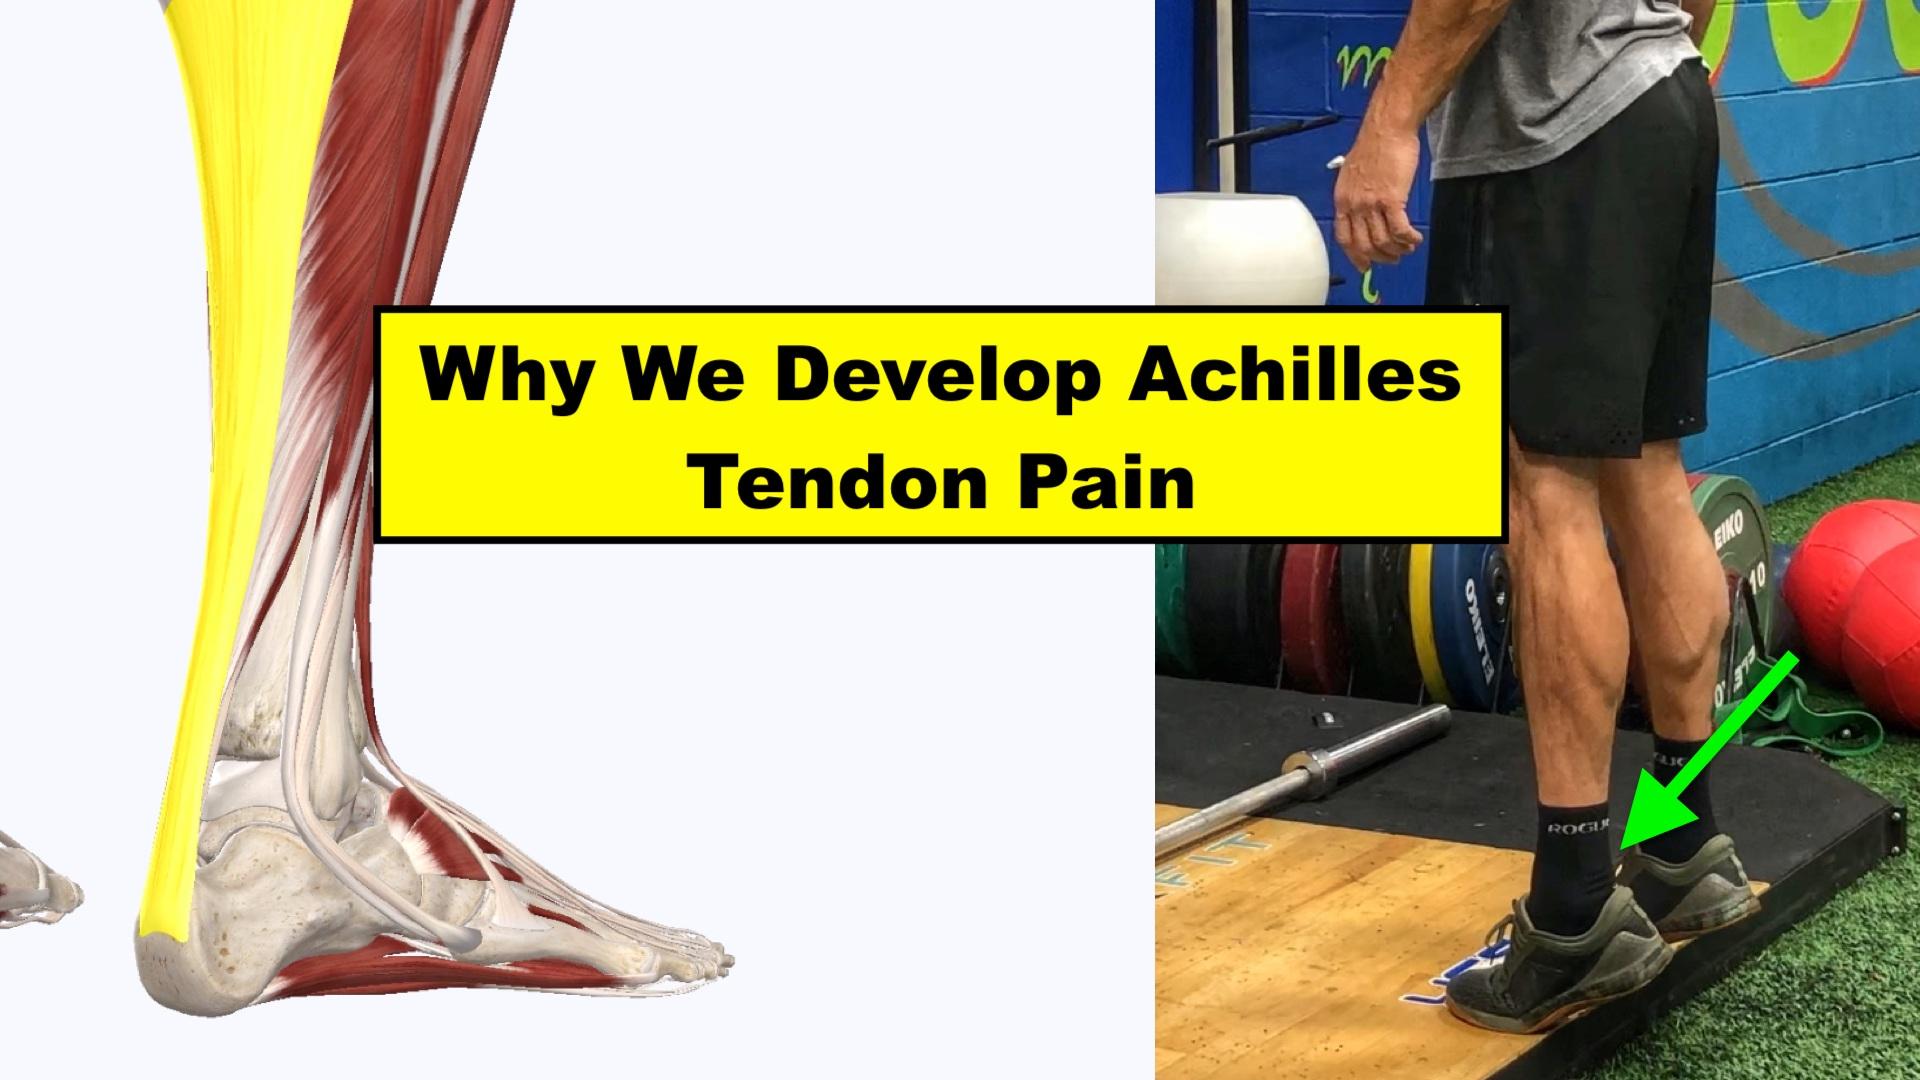 Injury to achilles tendon in running betting giro stage 10 betting advice